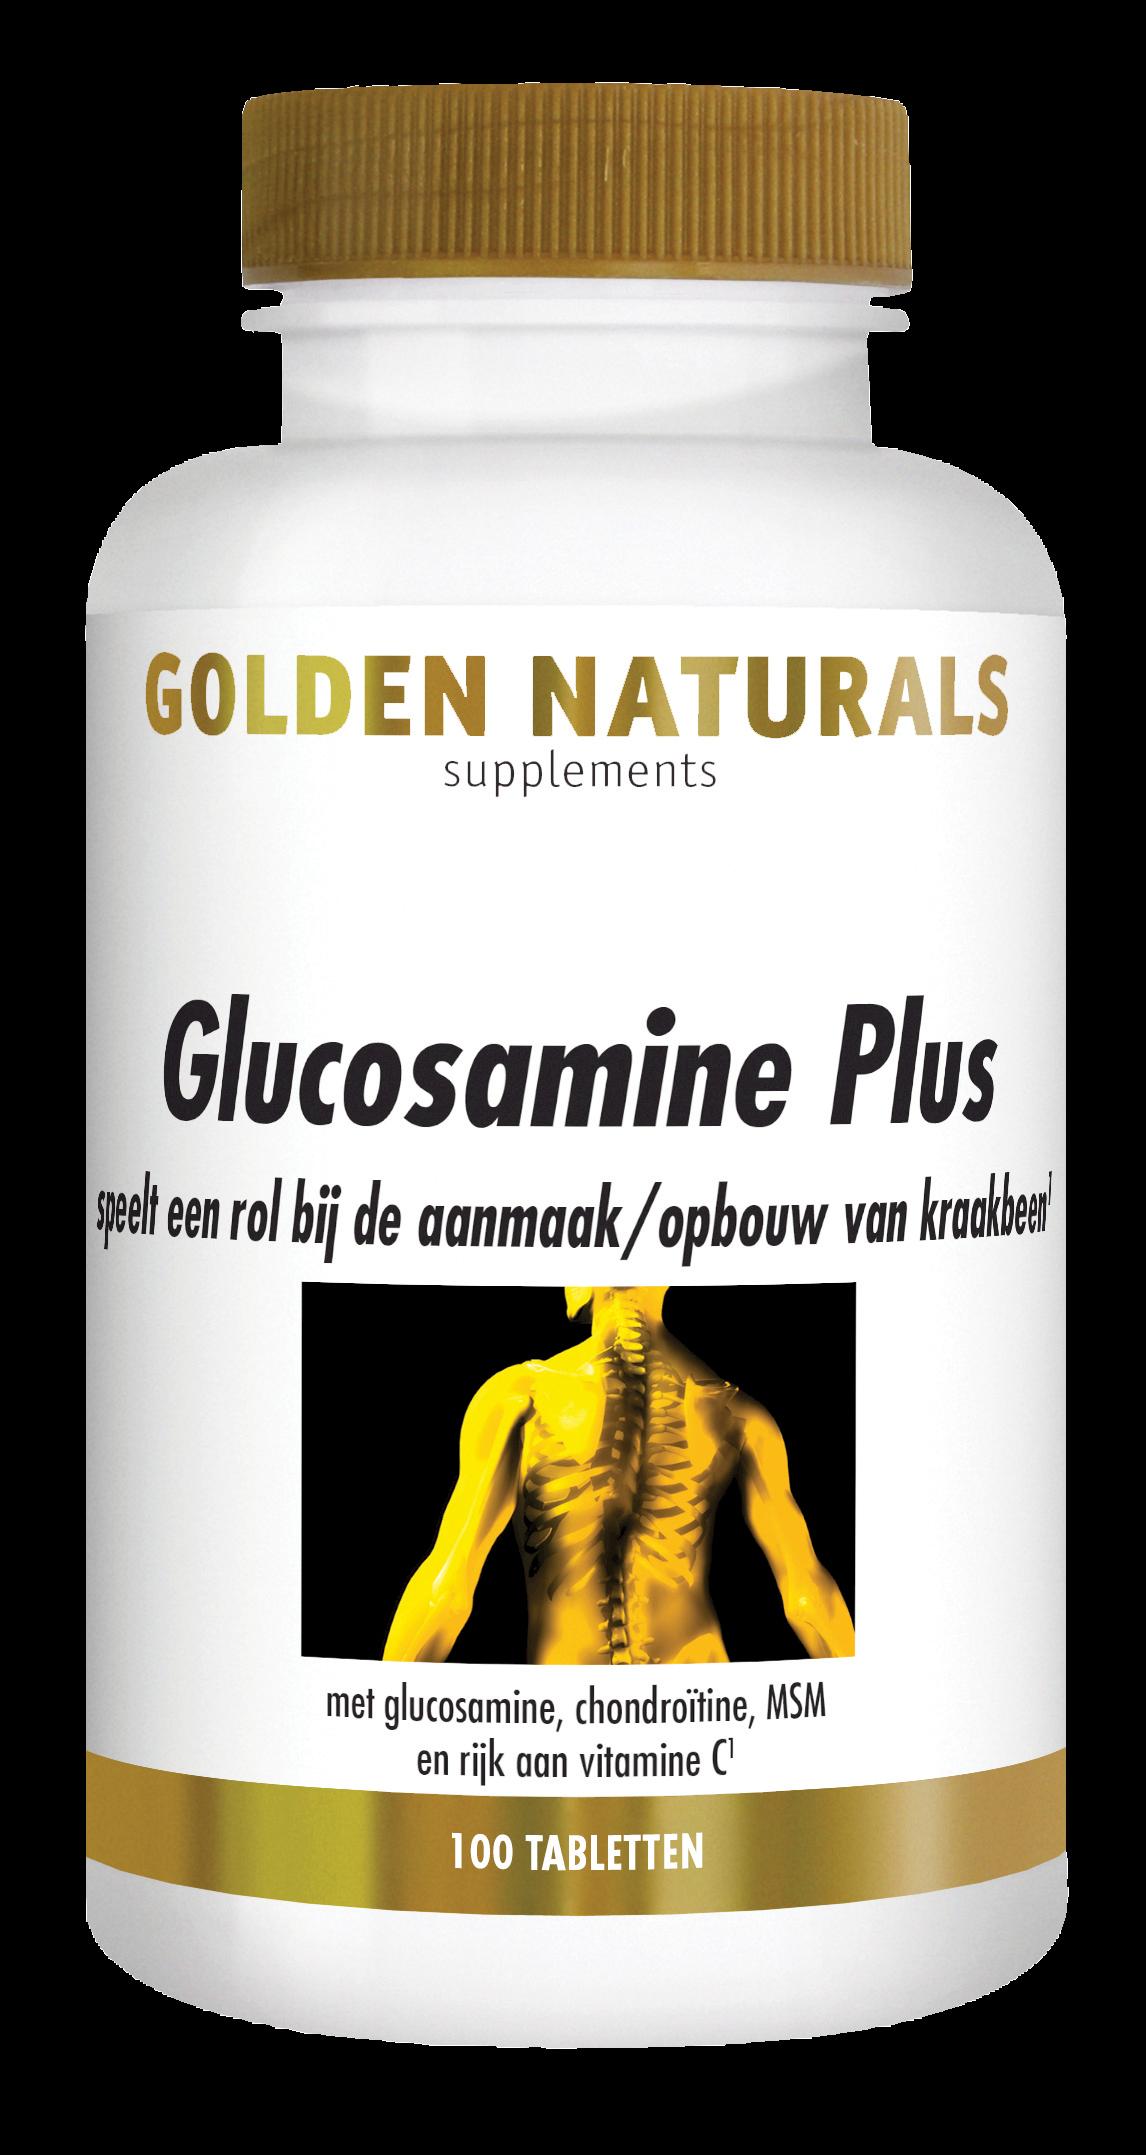 Golden Naturals Glucosamine Plus (100 tabletten)